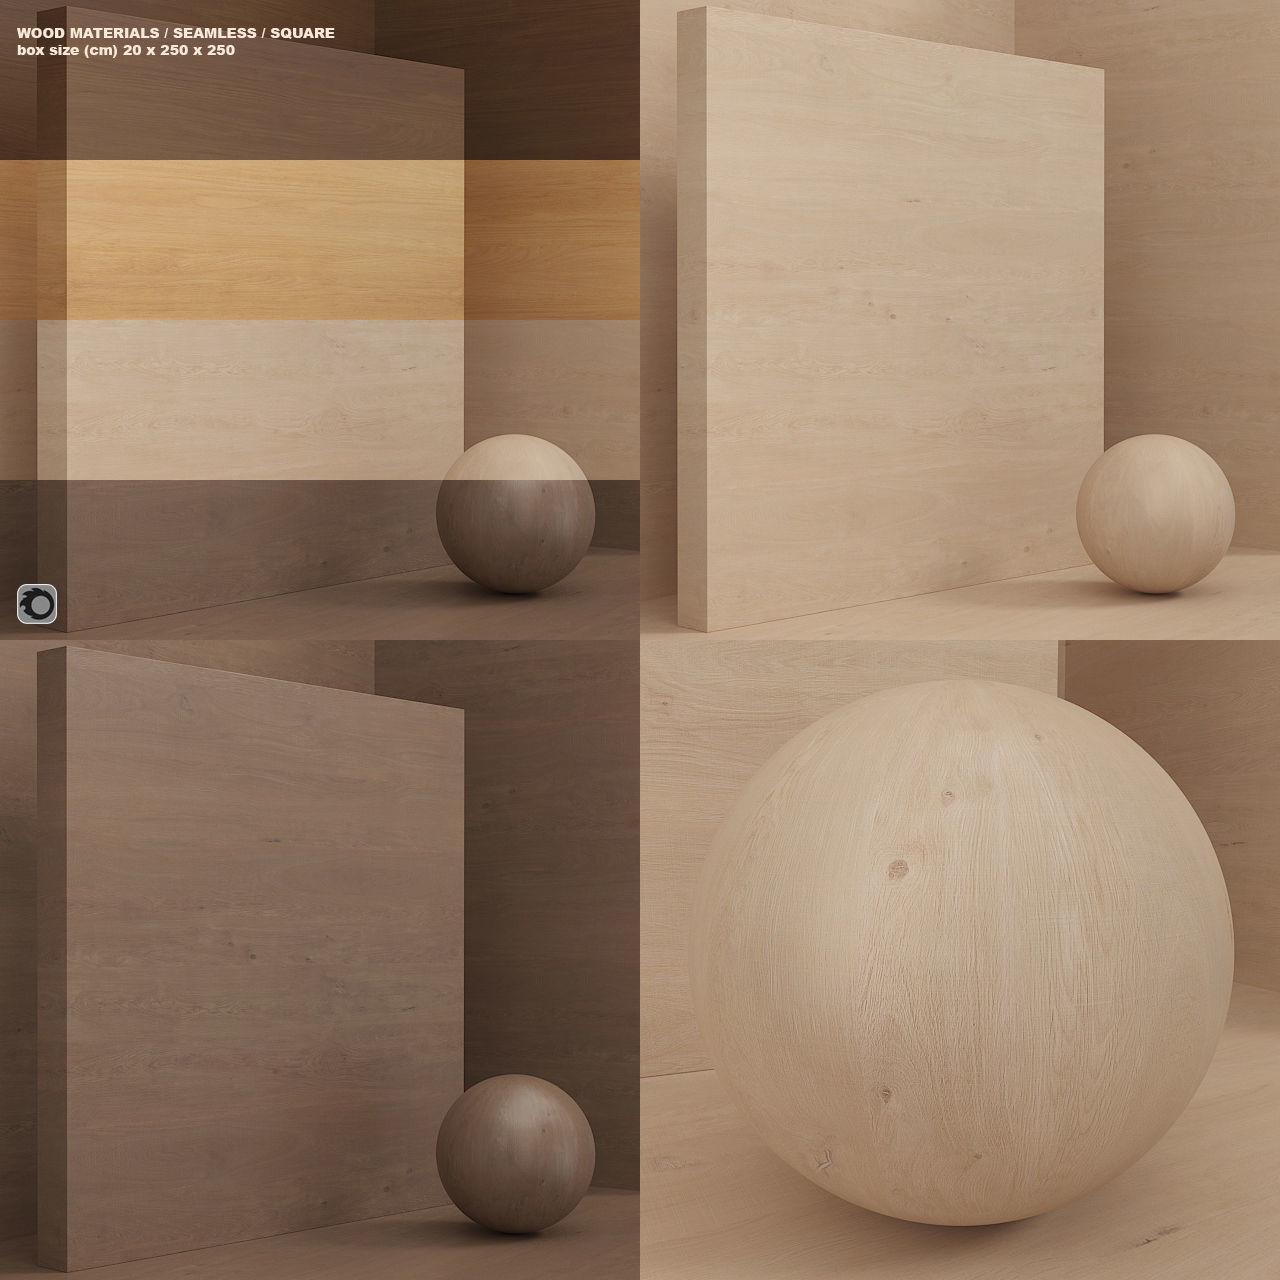 Wood material - veneer seamless